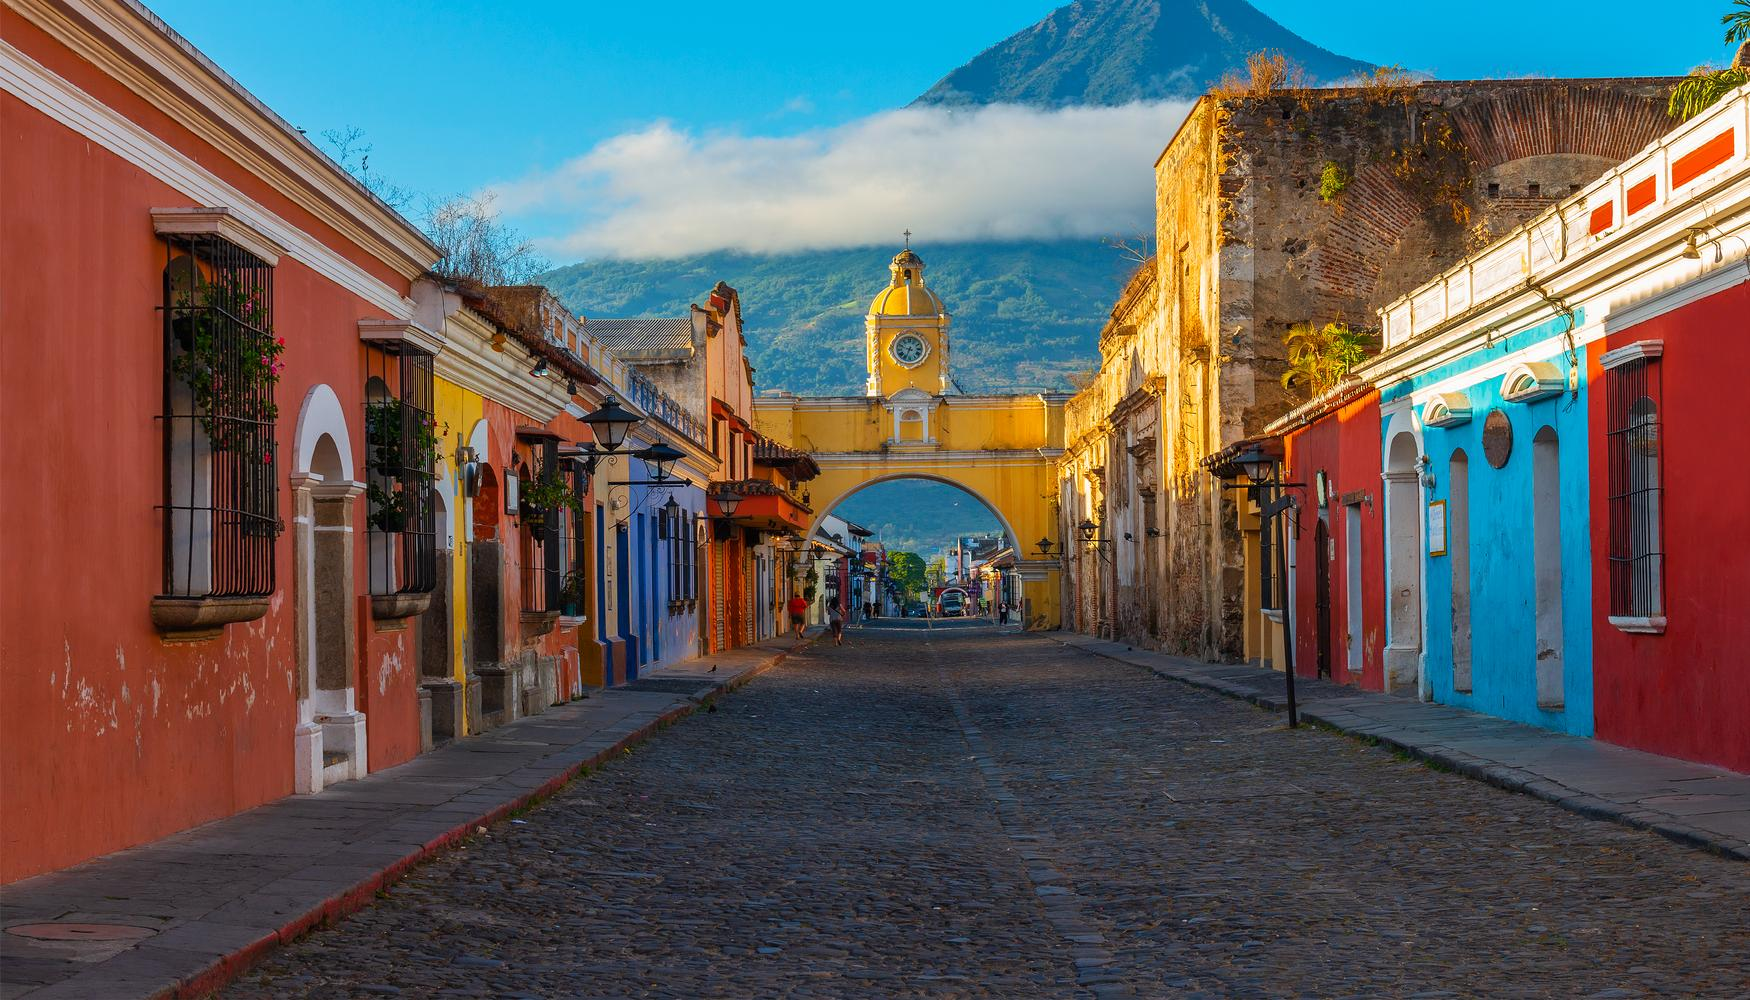 Aluguel de carros em Guatemala